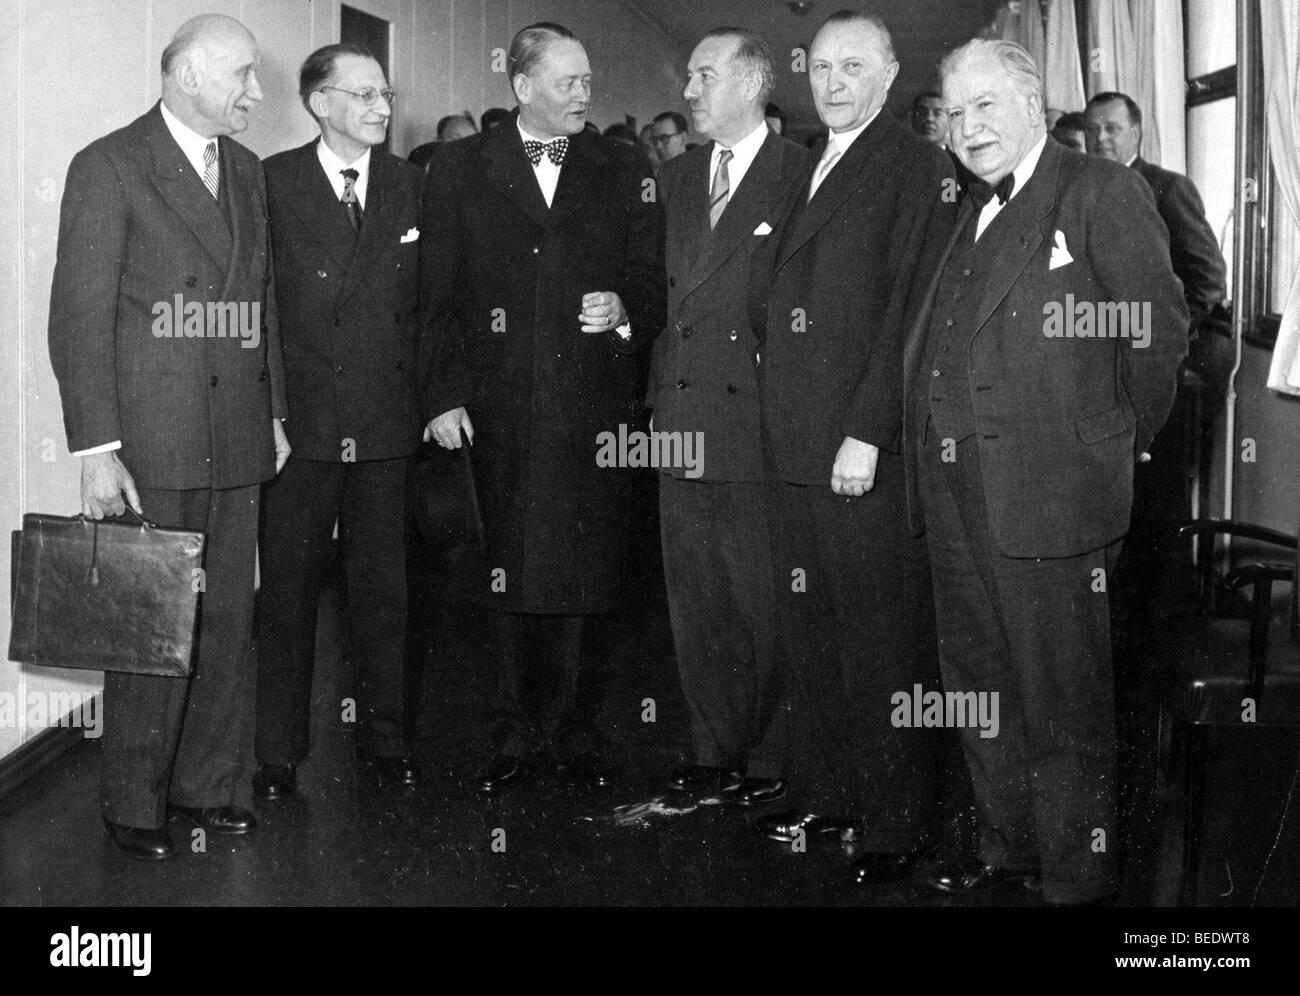 1003631 (900326) Treffen der 6 Aussenminister; v.l.n.r. : Robert SCHUMAN (Frankreich), Alcide De GASPARI (Italien), - Stock Image